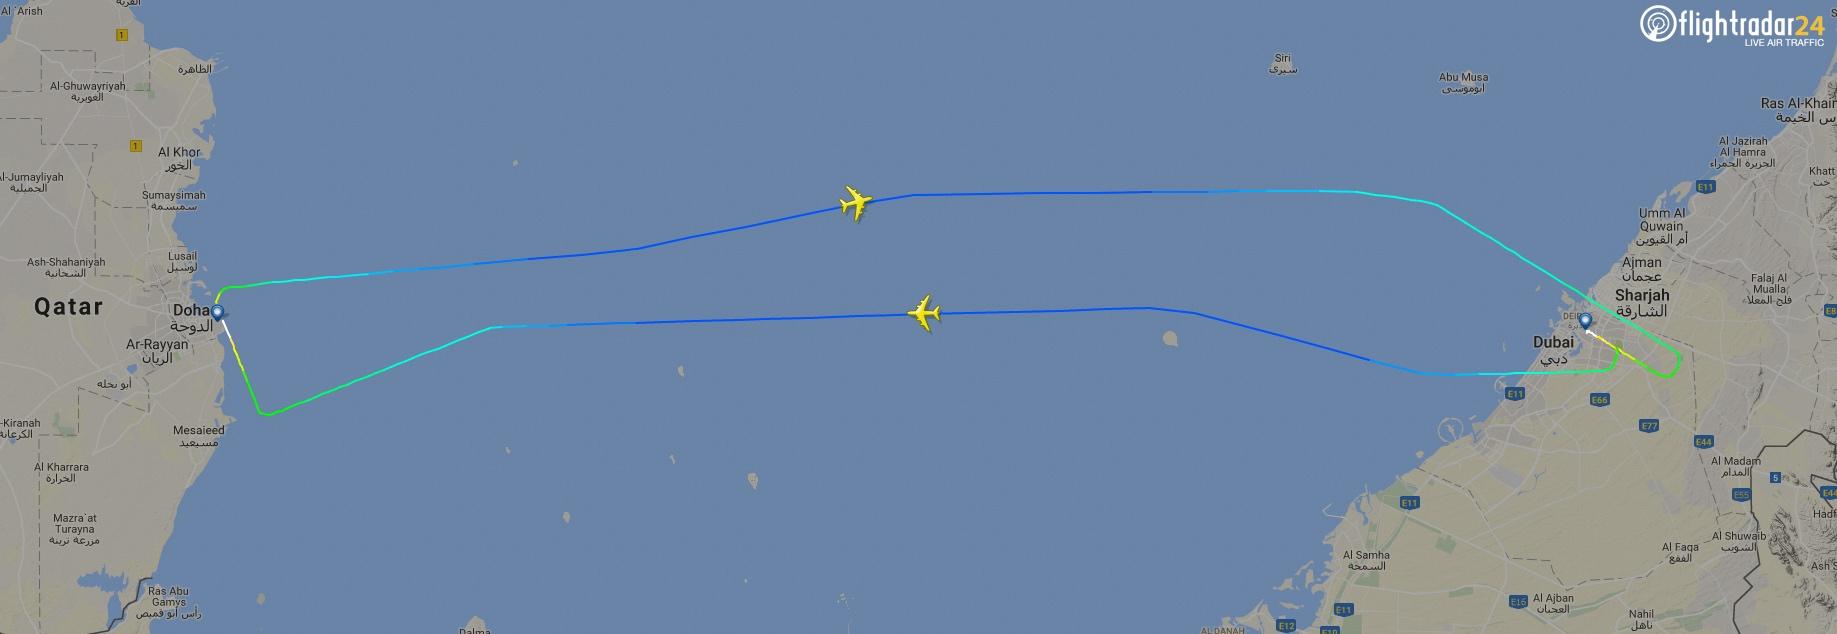 The world's shortest A380 flight, Dubai-Doha